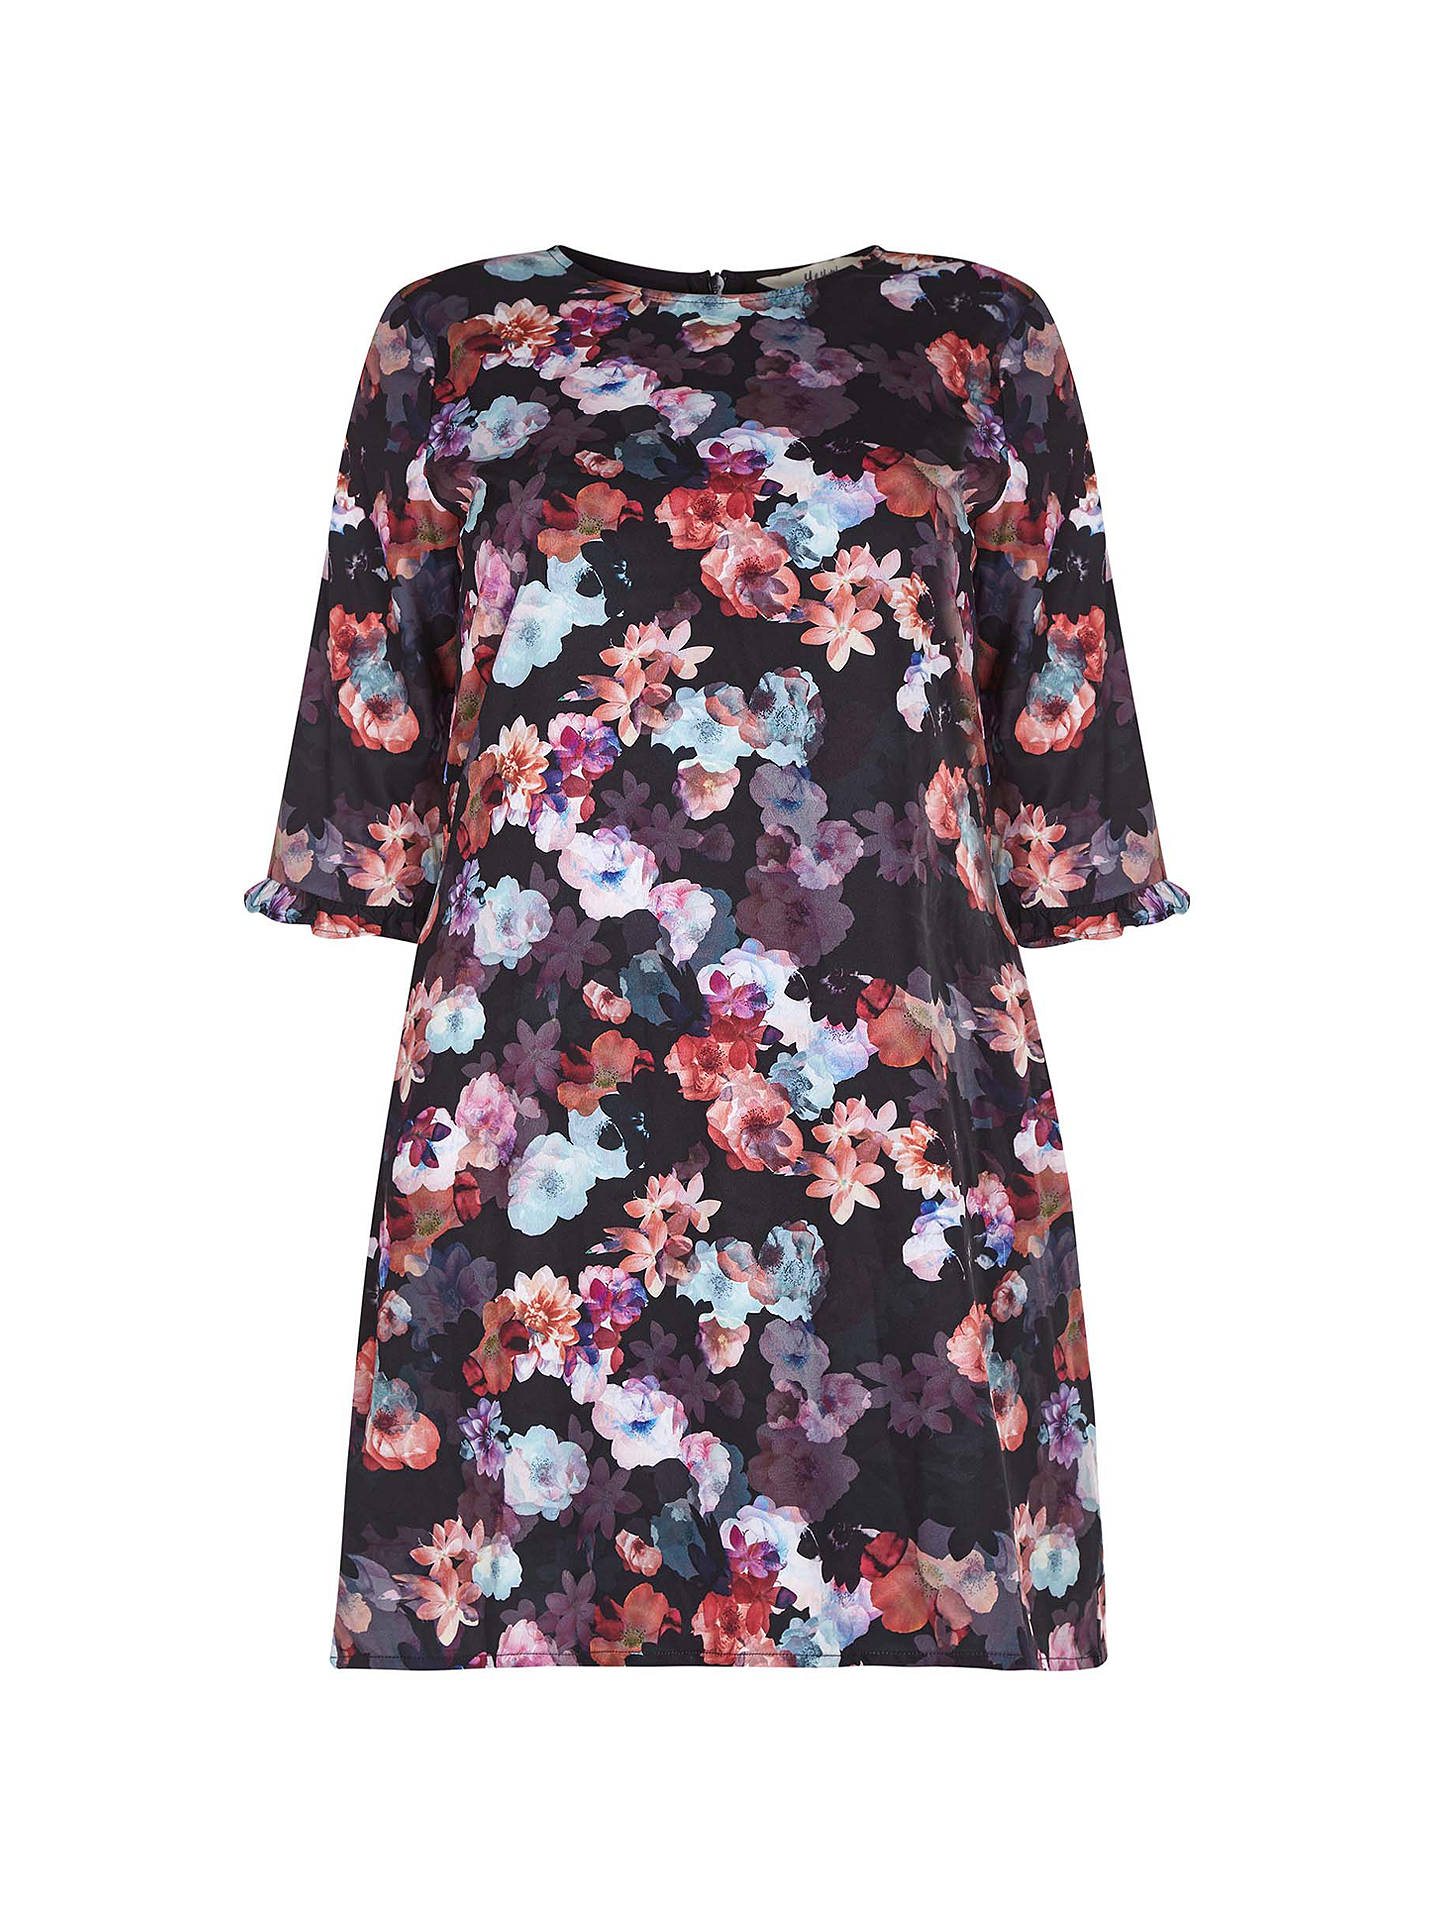 4099a259992 ... Buy Yumi Curves Nouvea Floral Tunic Dress, Black, 18 Online at  johnlewis.com ...